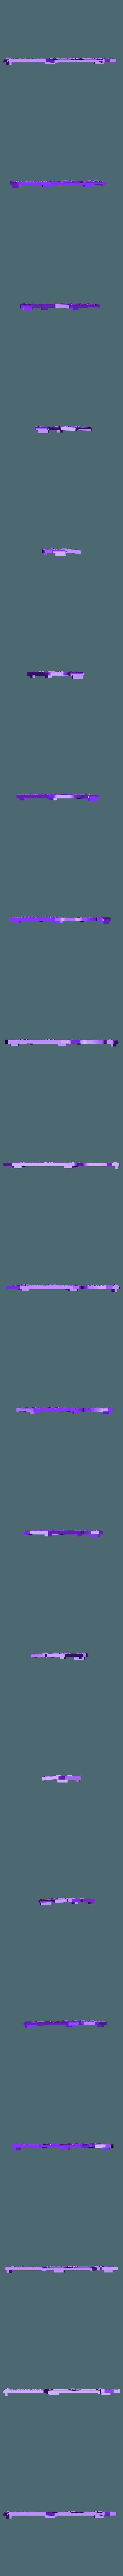 ladoizq1.stl Download STL file HUMMER H1 - Assembly model kit 1:35 • 3D print model, guillesilvestrini